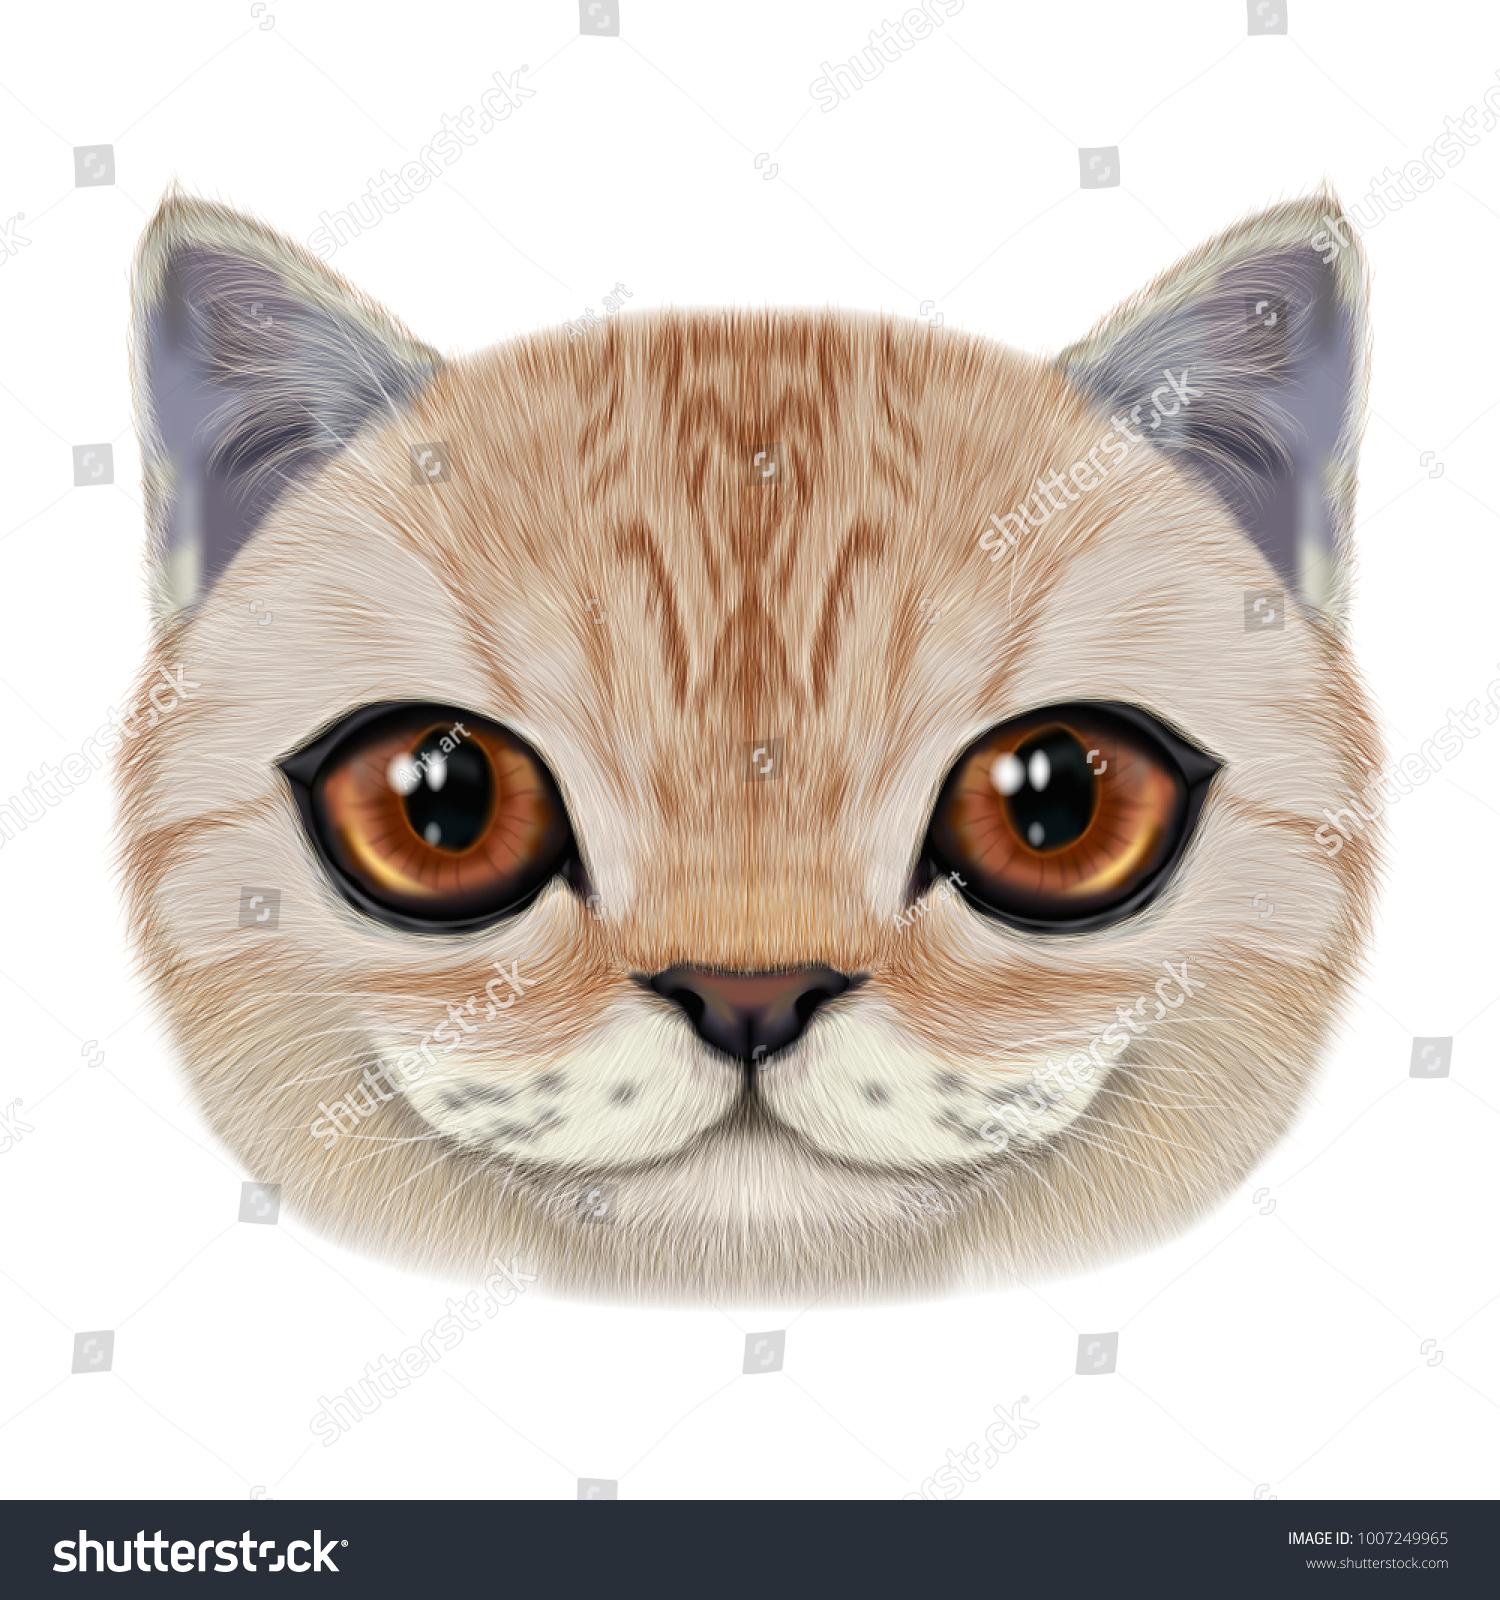 Illustration Portrait Domestic Cat Cute Realistic Stock Illustration ...